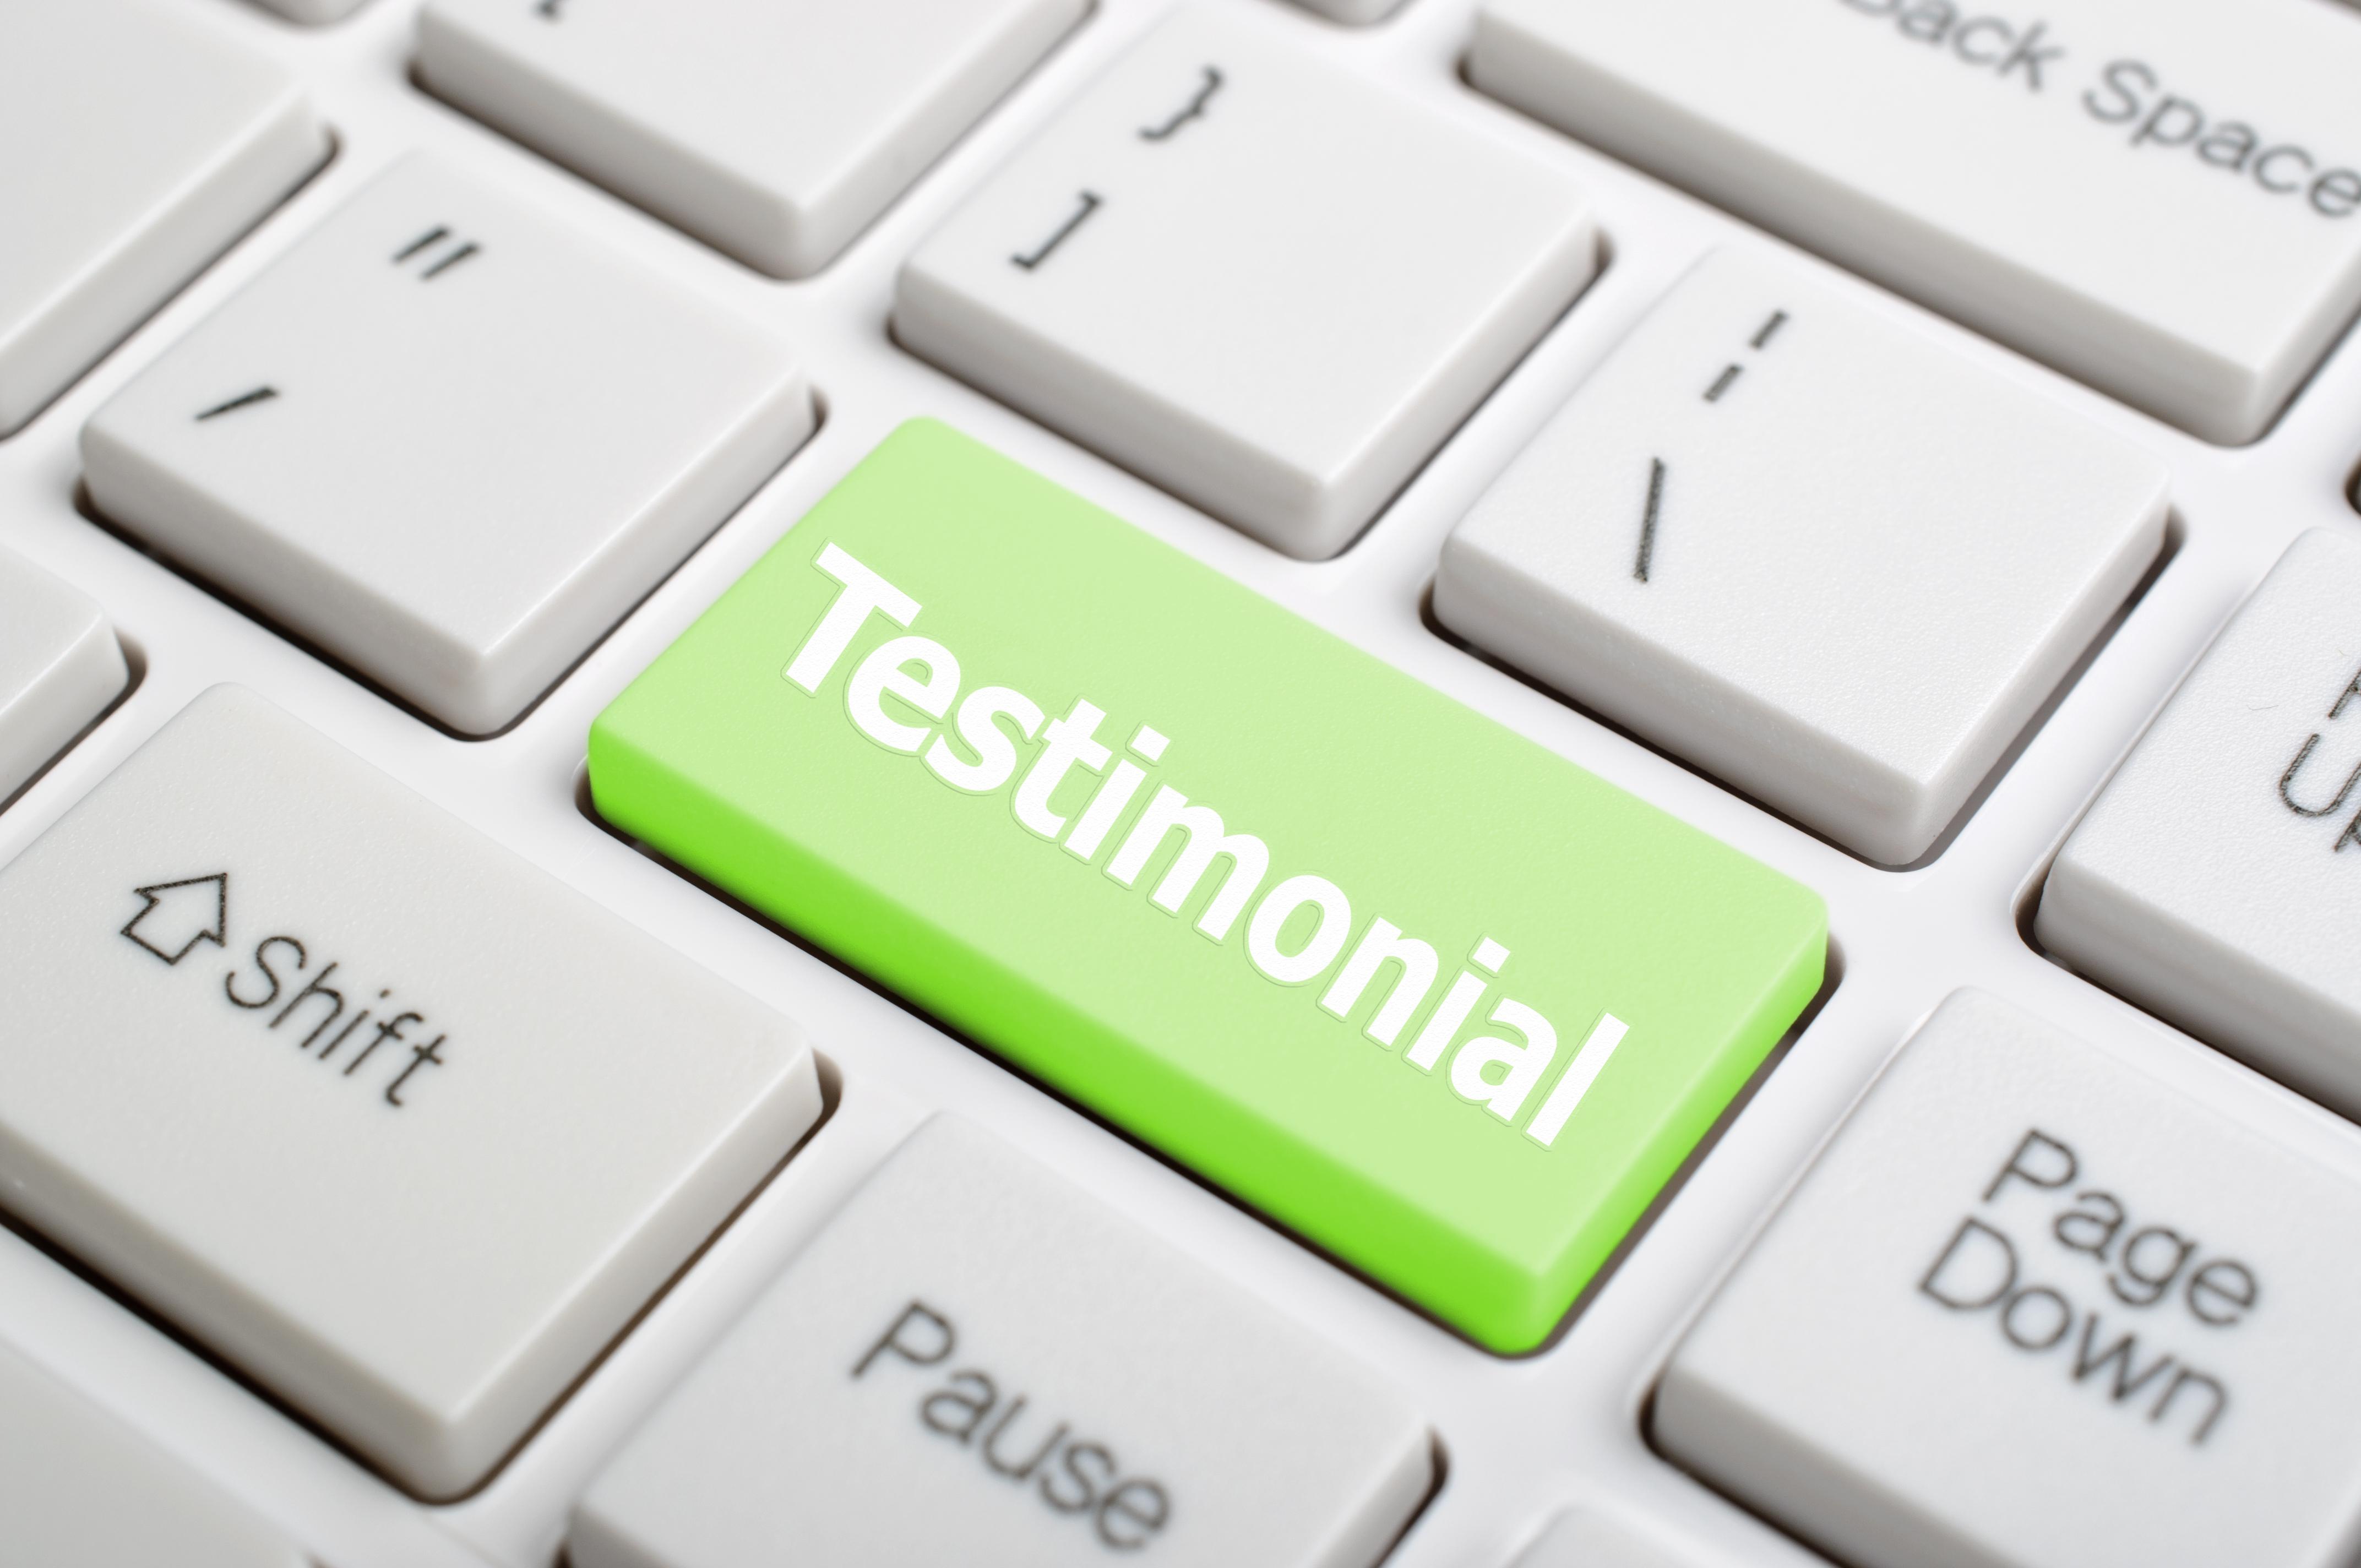 bigstock-Testimonial-on-keyboard-42496384